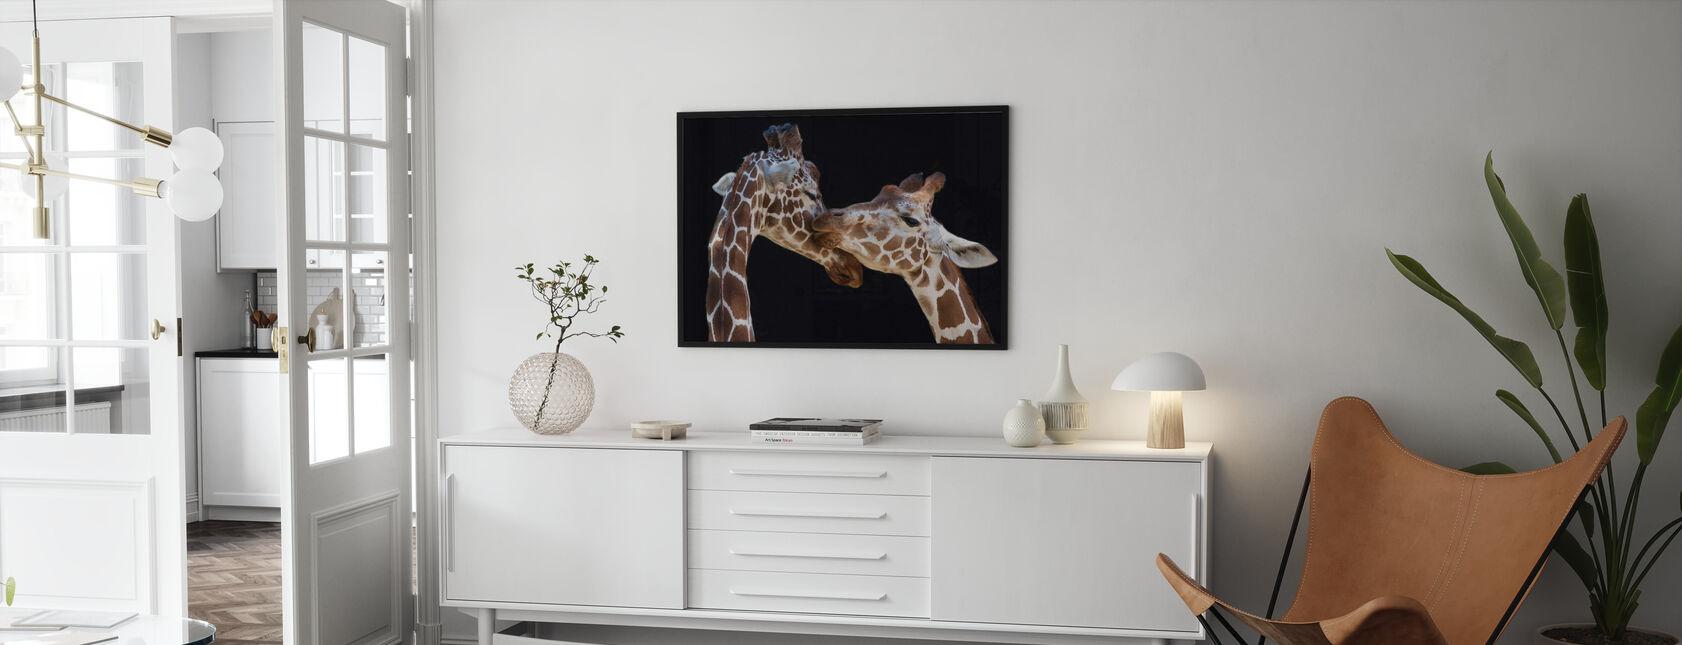 Giraffen zoenen - Ingelijste print - Woonkamer